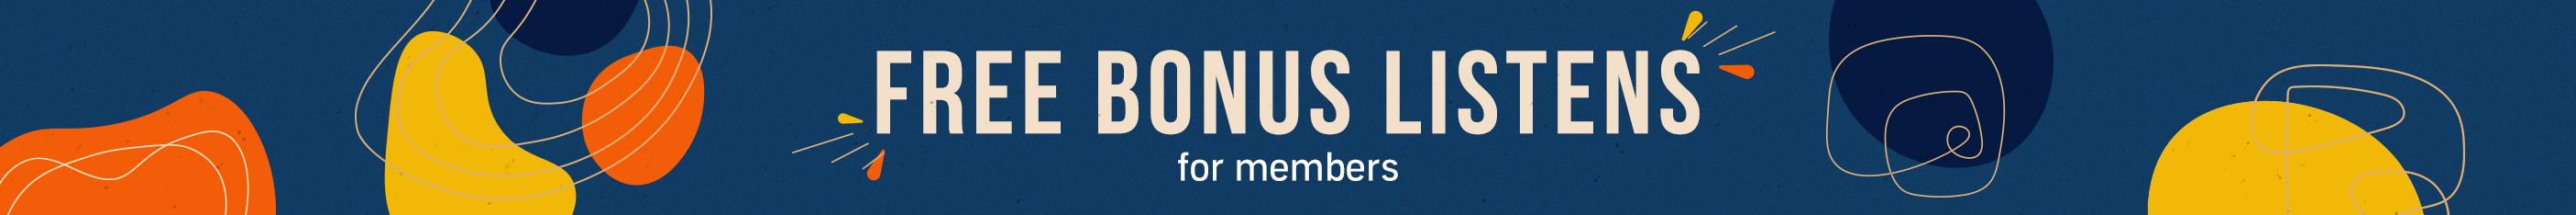 Free bonus listens for our members.